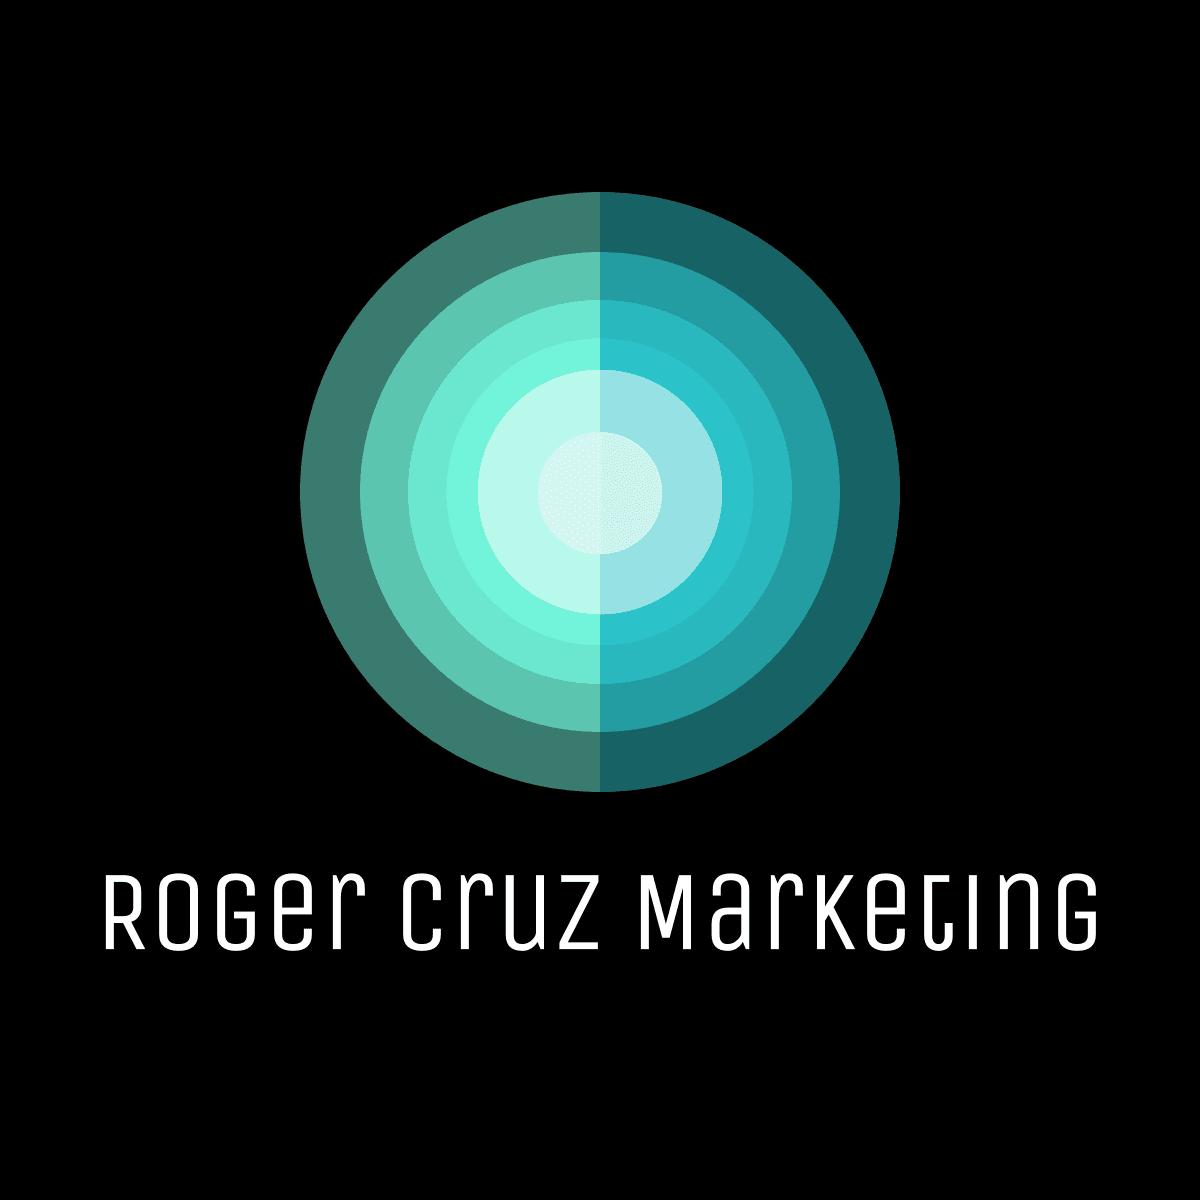 Roger Cruz Marketing